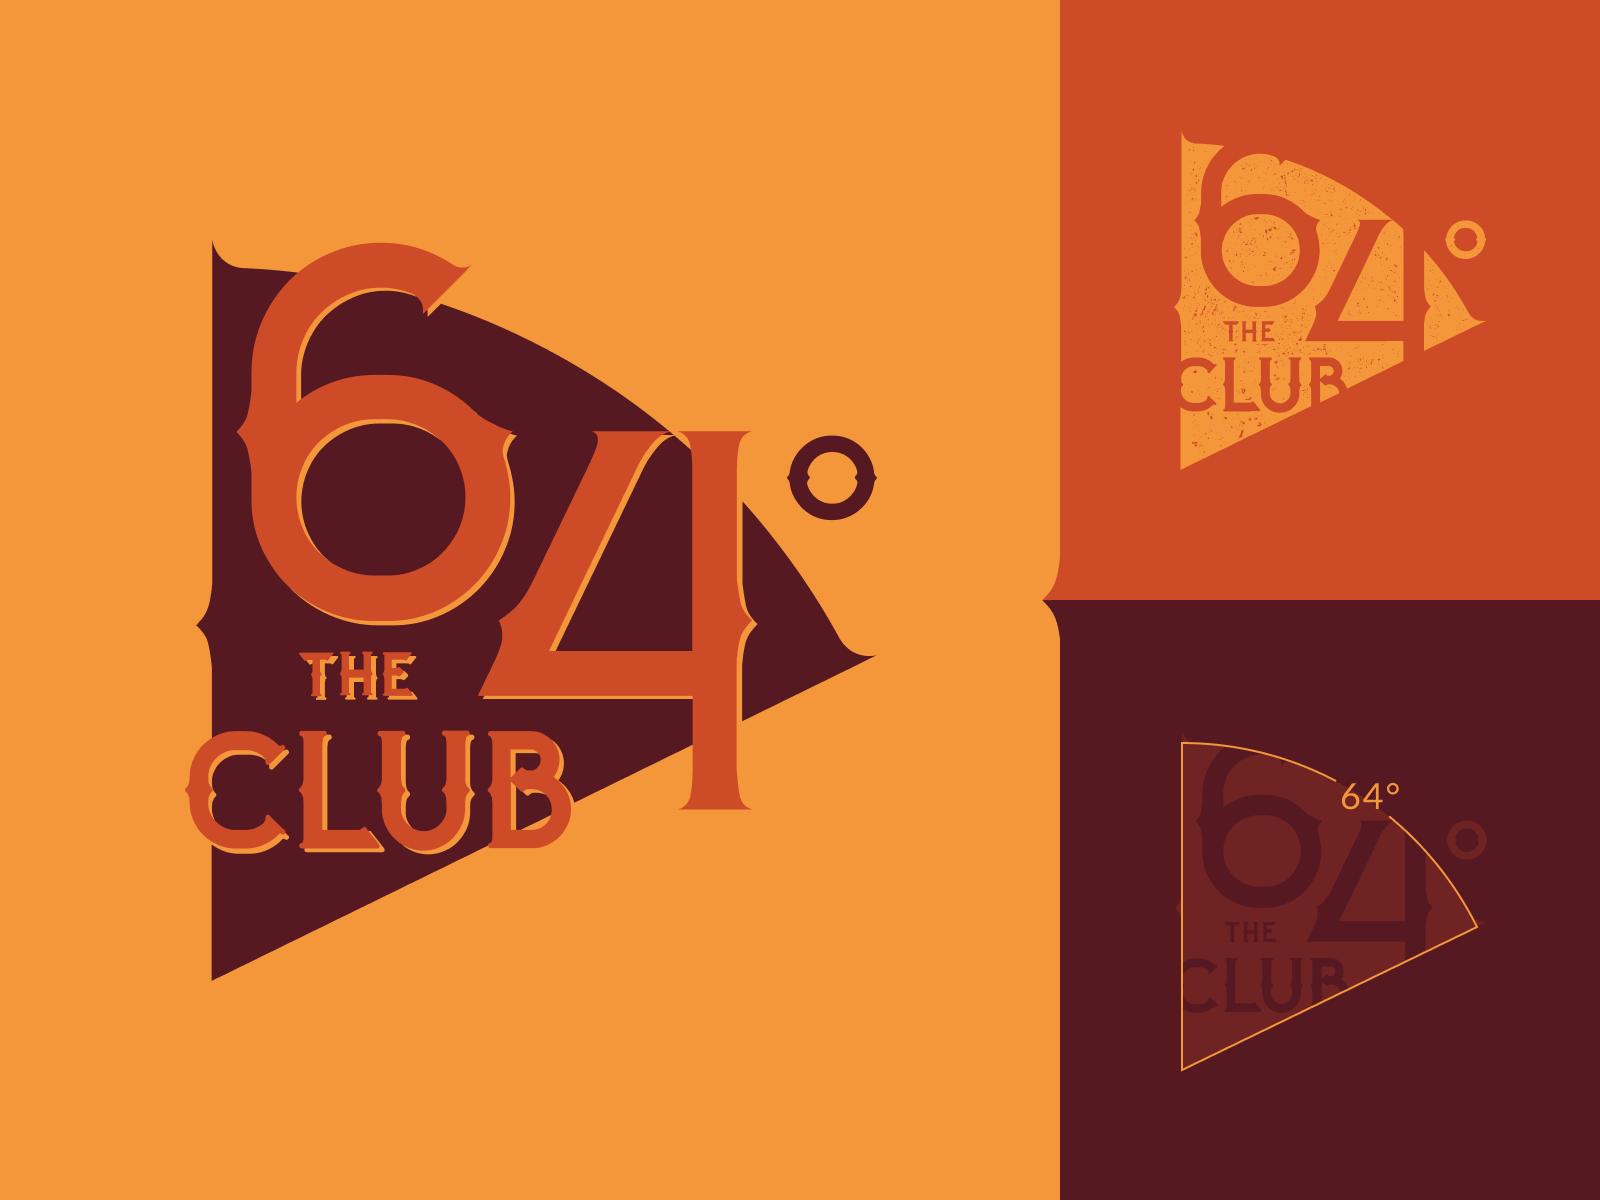 The64club_logo_dribbble1